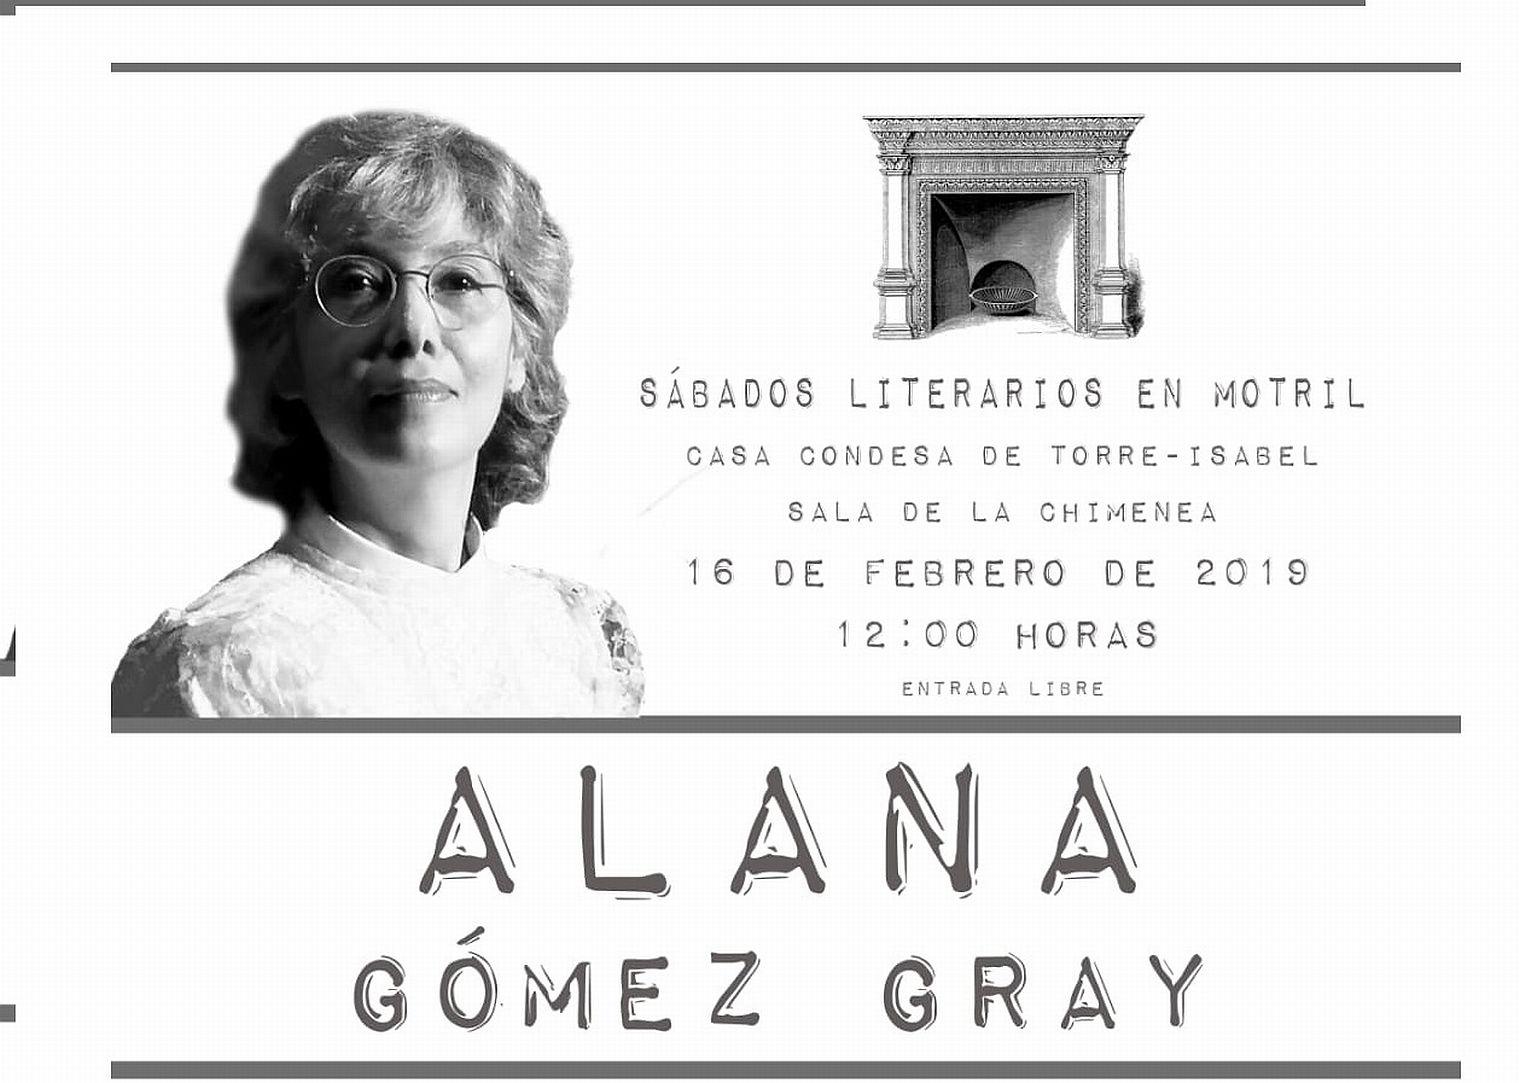 Alana Gómez